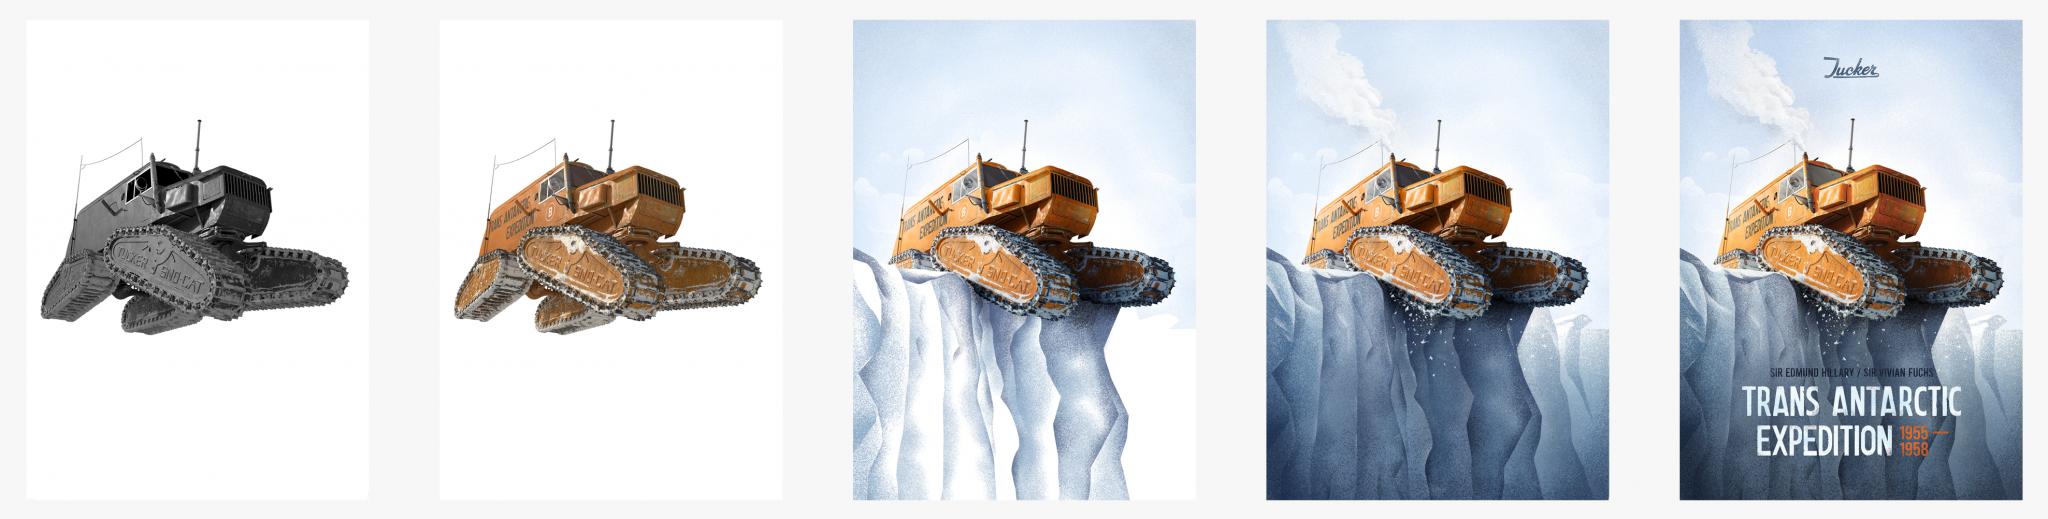 Automobilist Trans Antarctic Expedition Creation